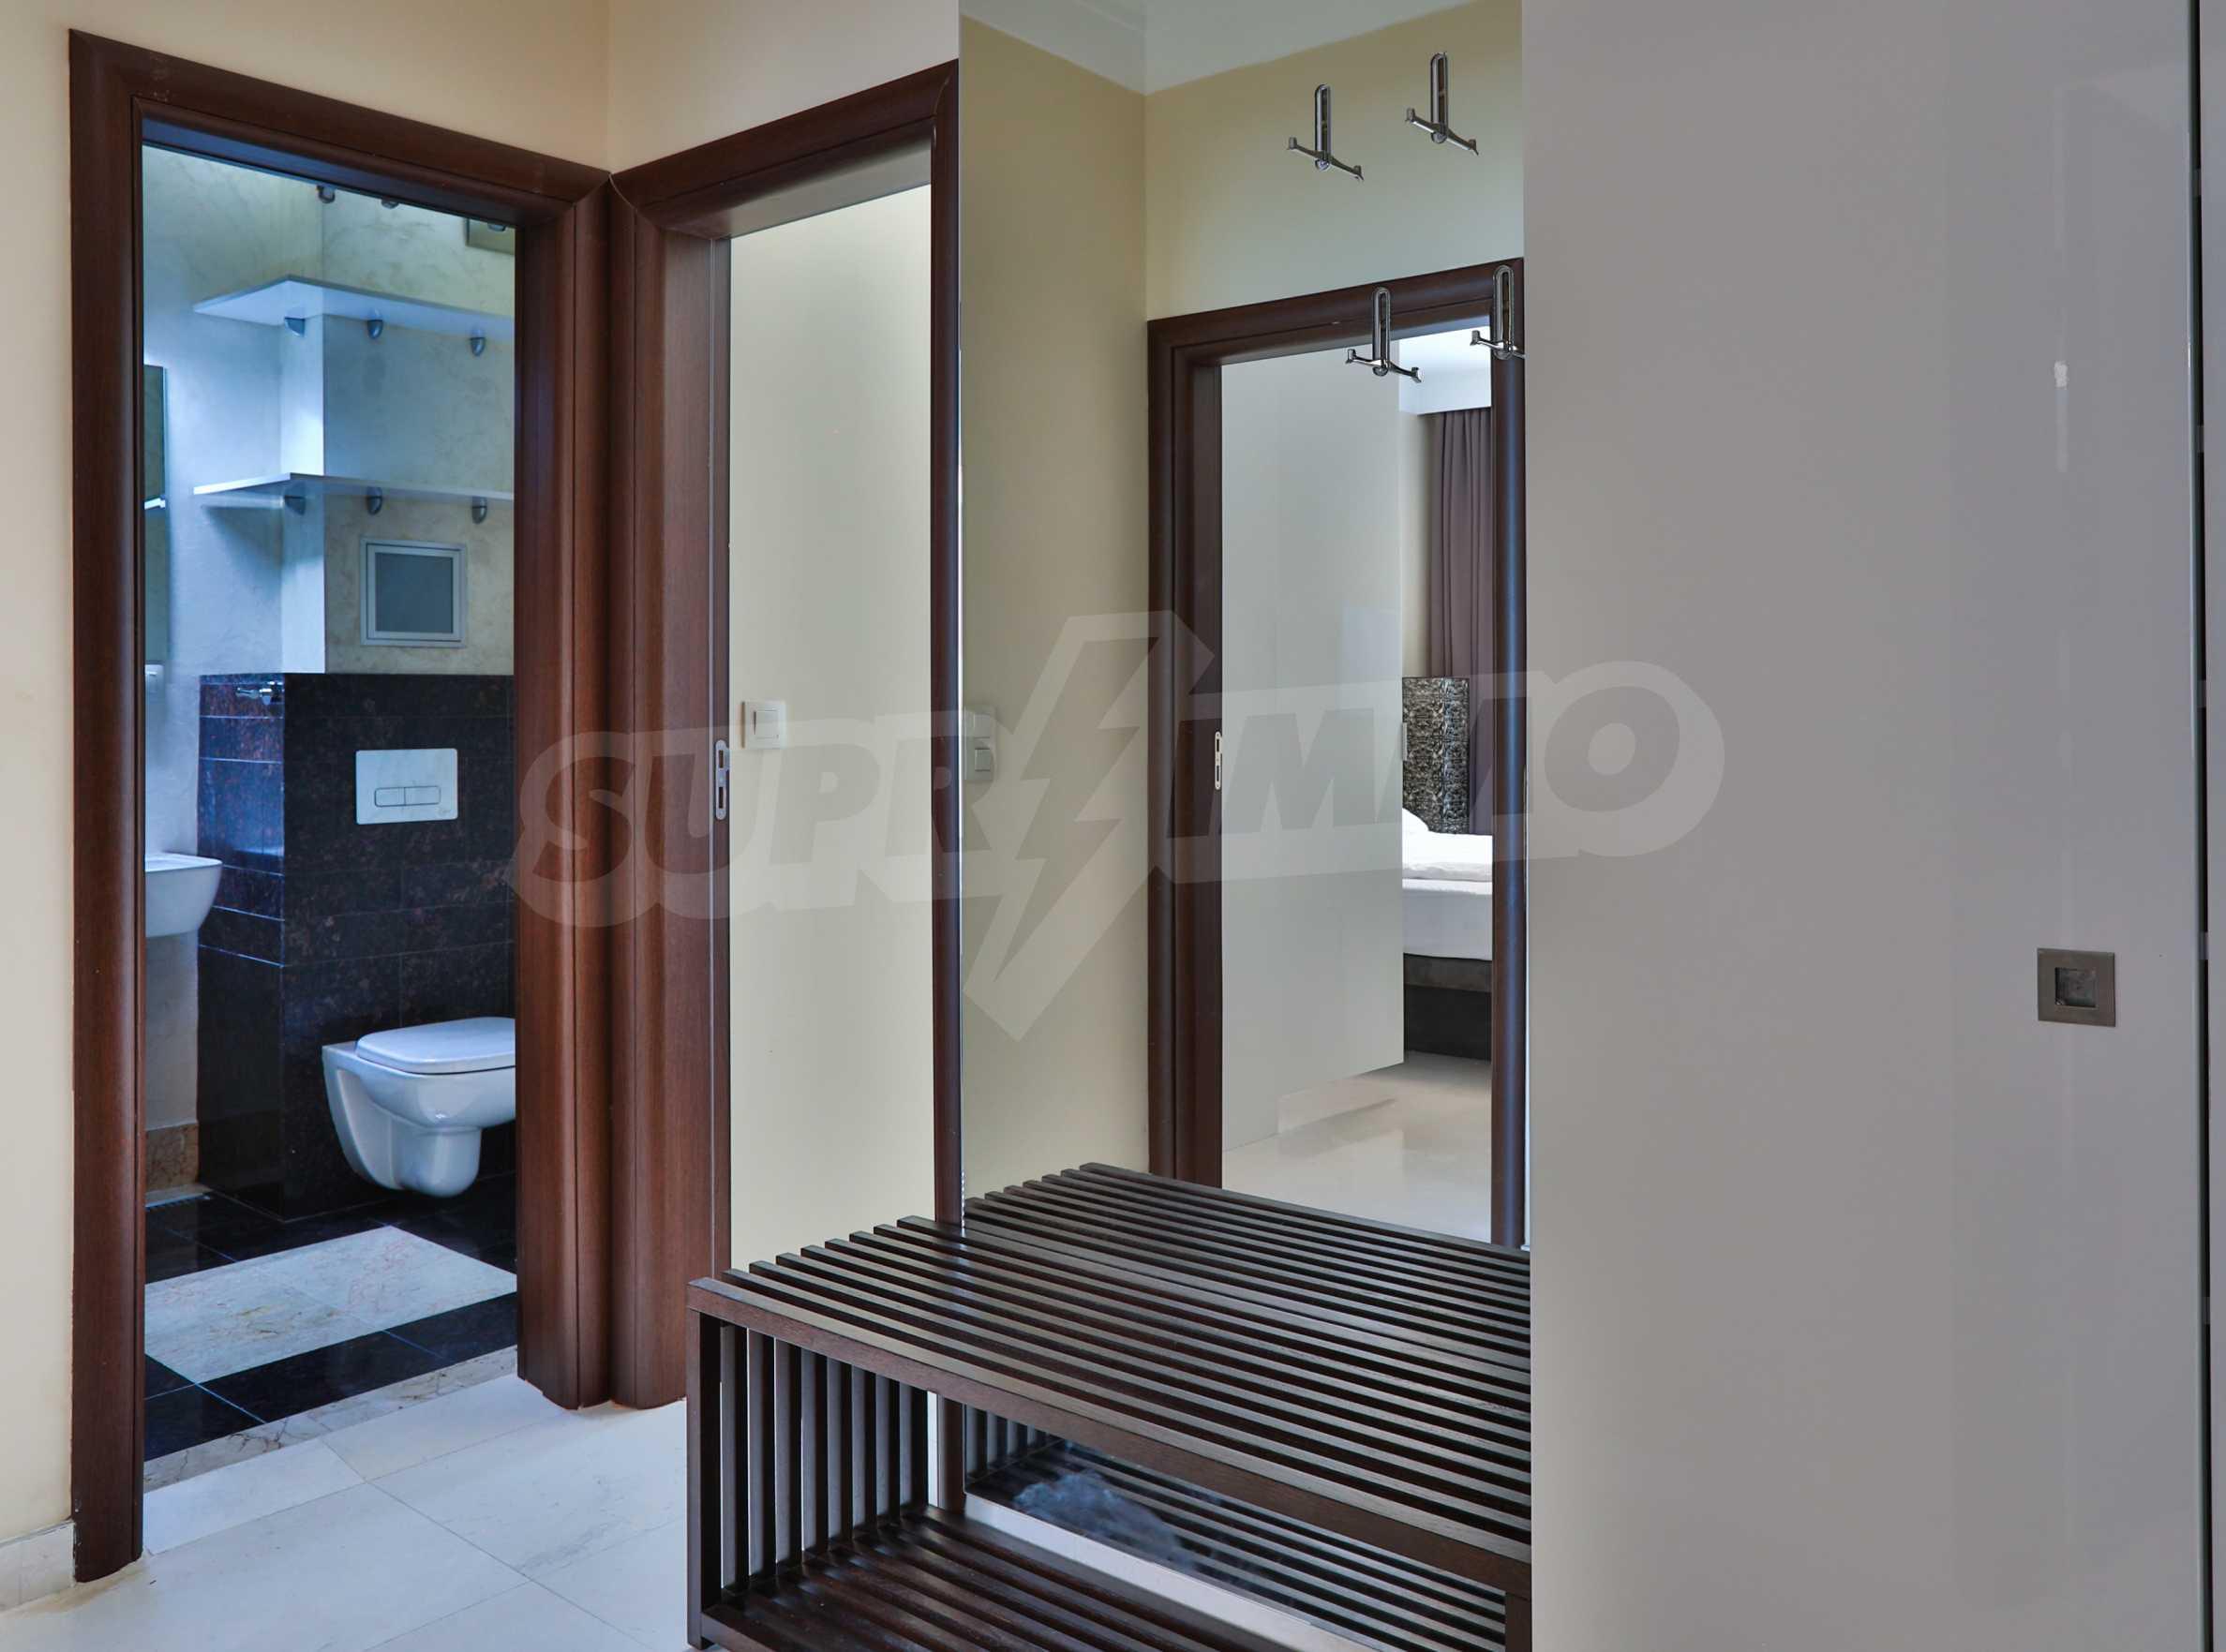 Exclusive 2-bedroom beachfront apartment in the prestigious Belle Époque Beach Residence 27